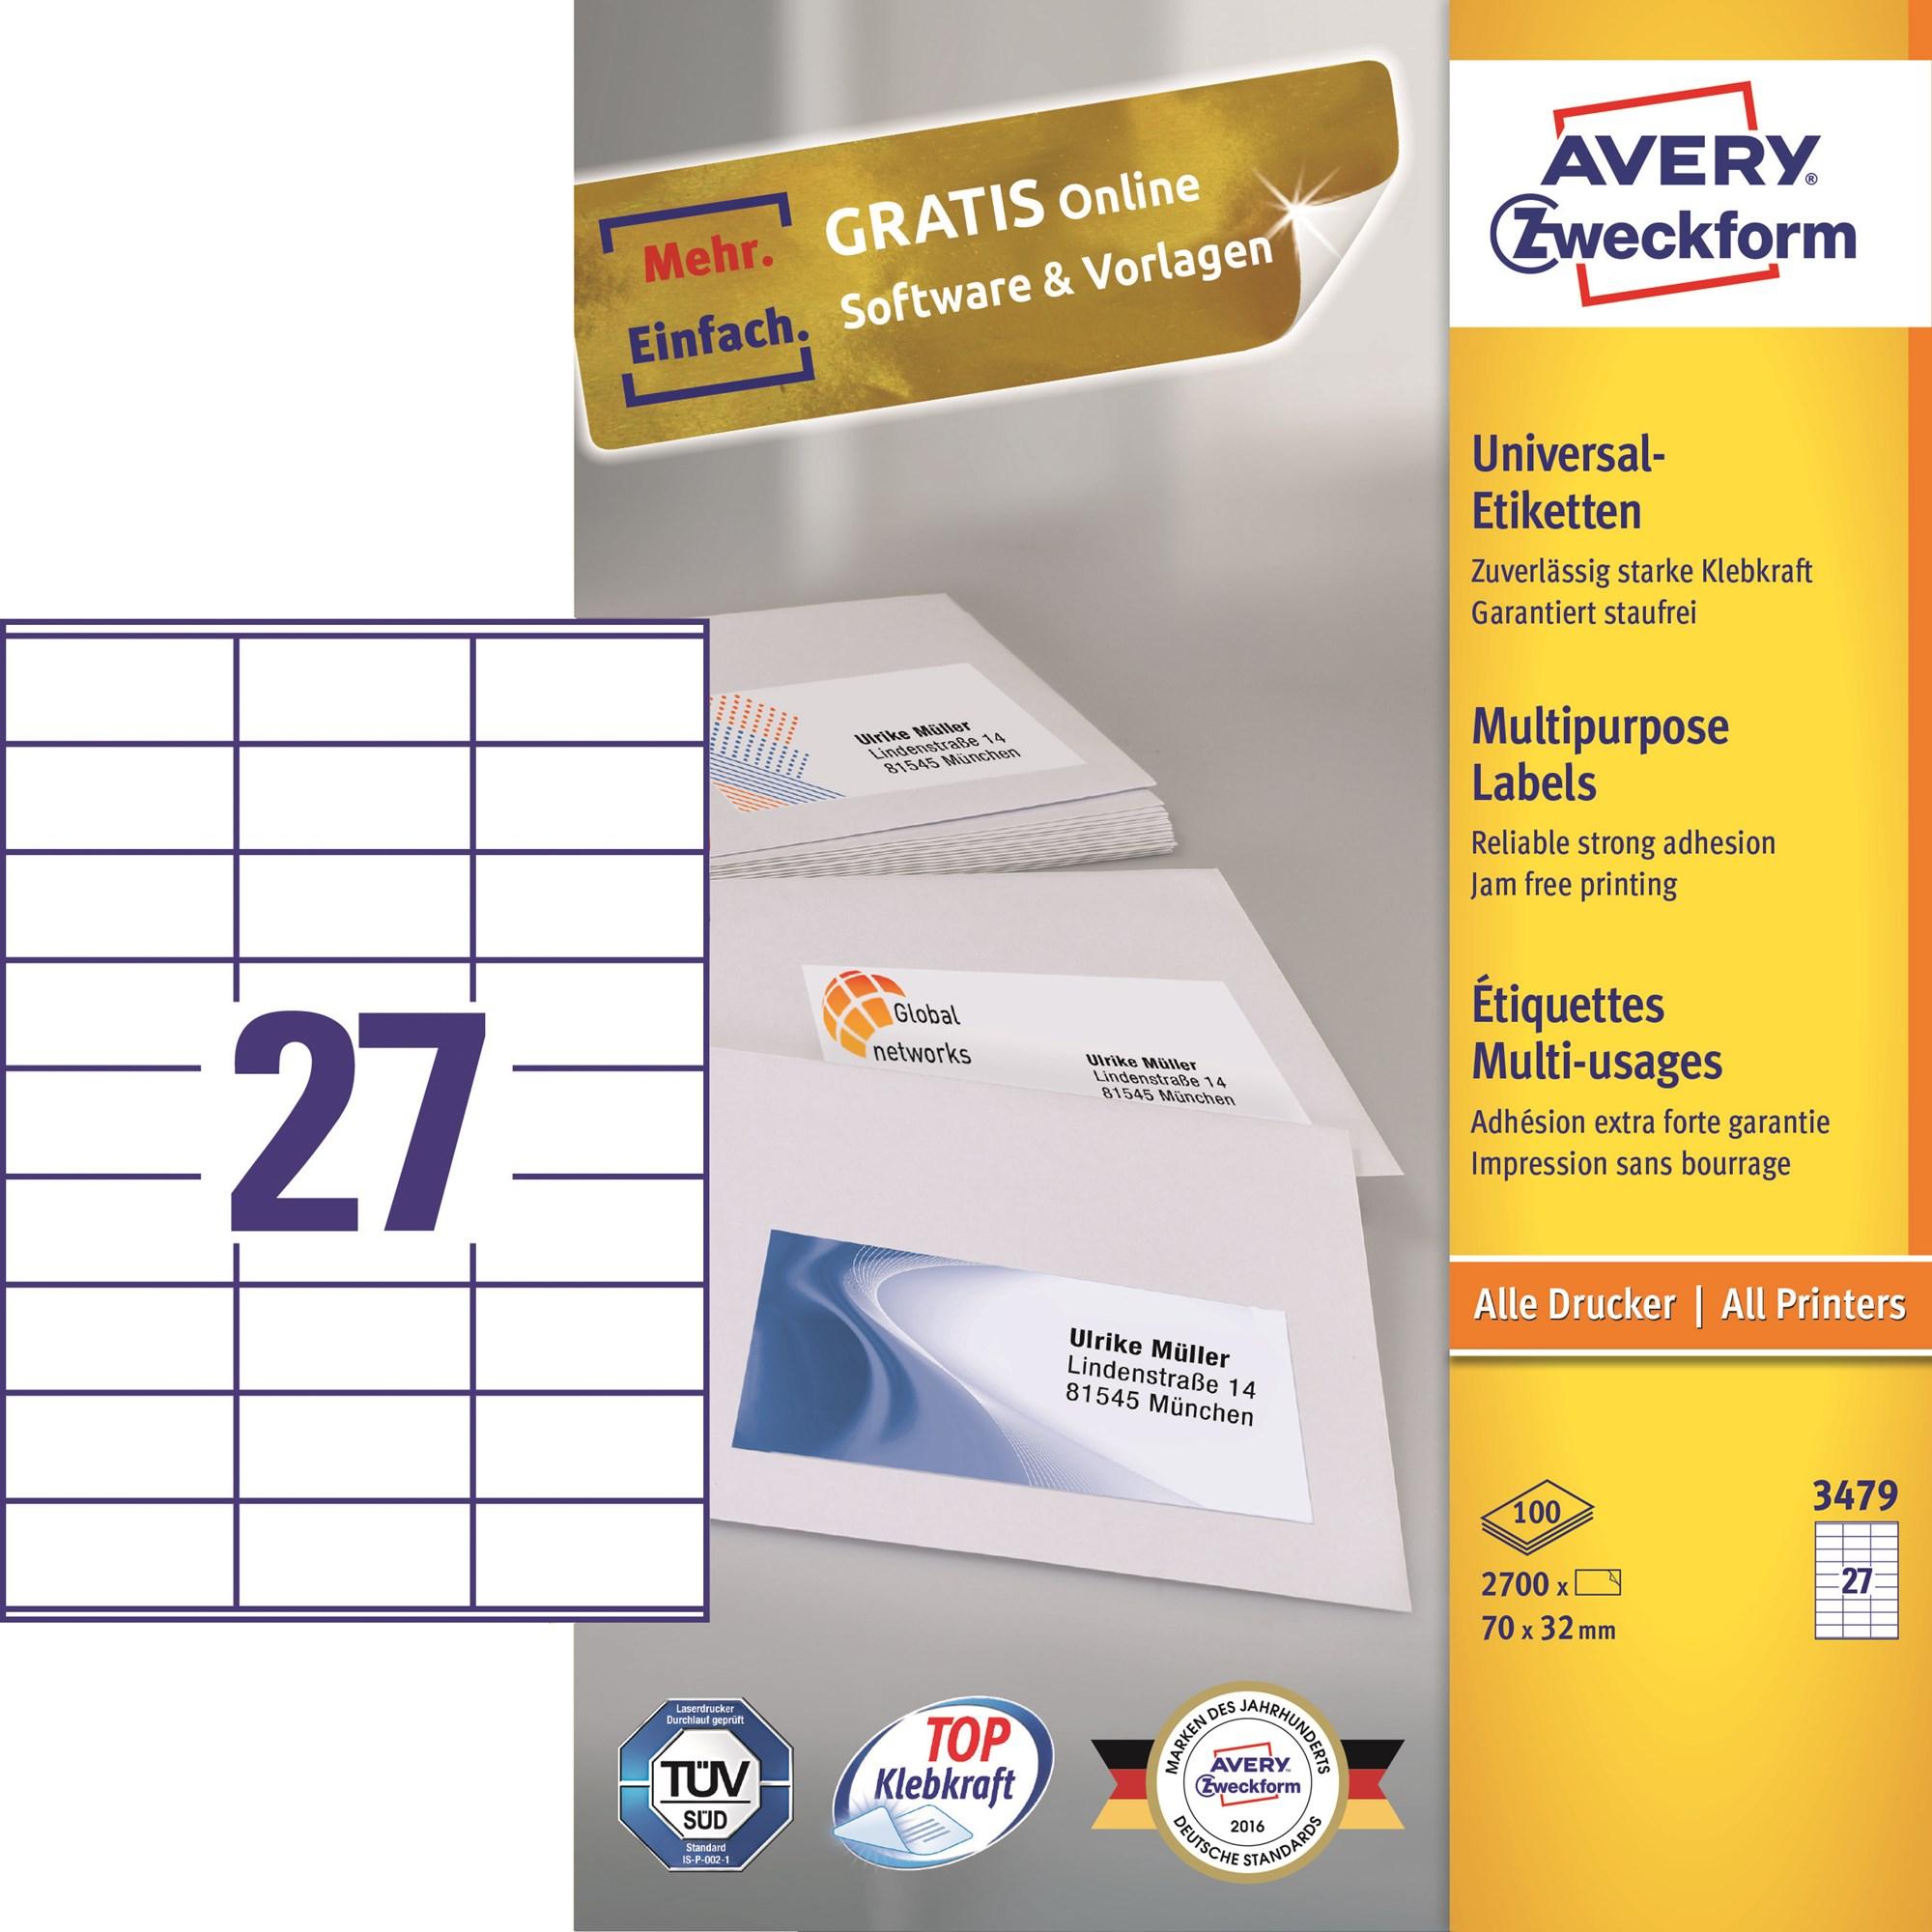 Image of Avery ILC universal etiket 70x32mm (2700)